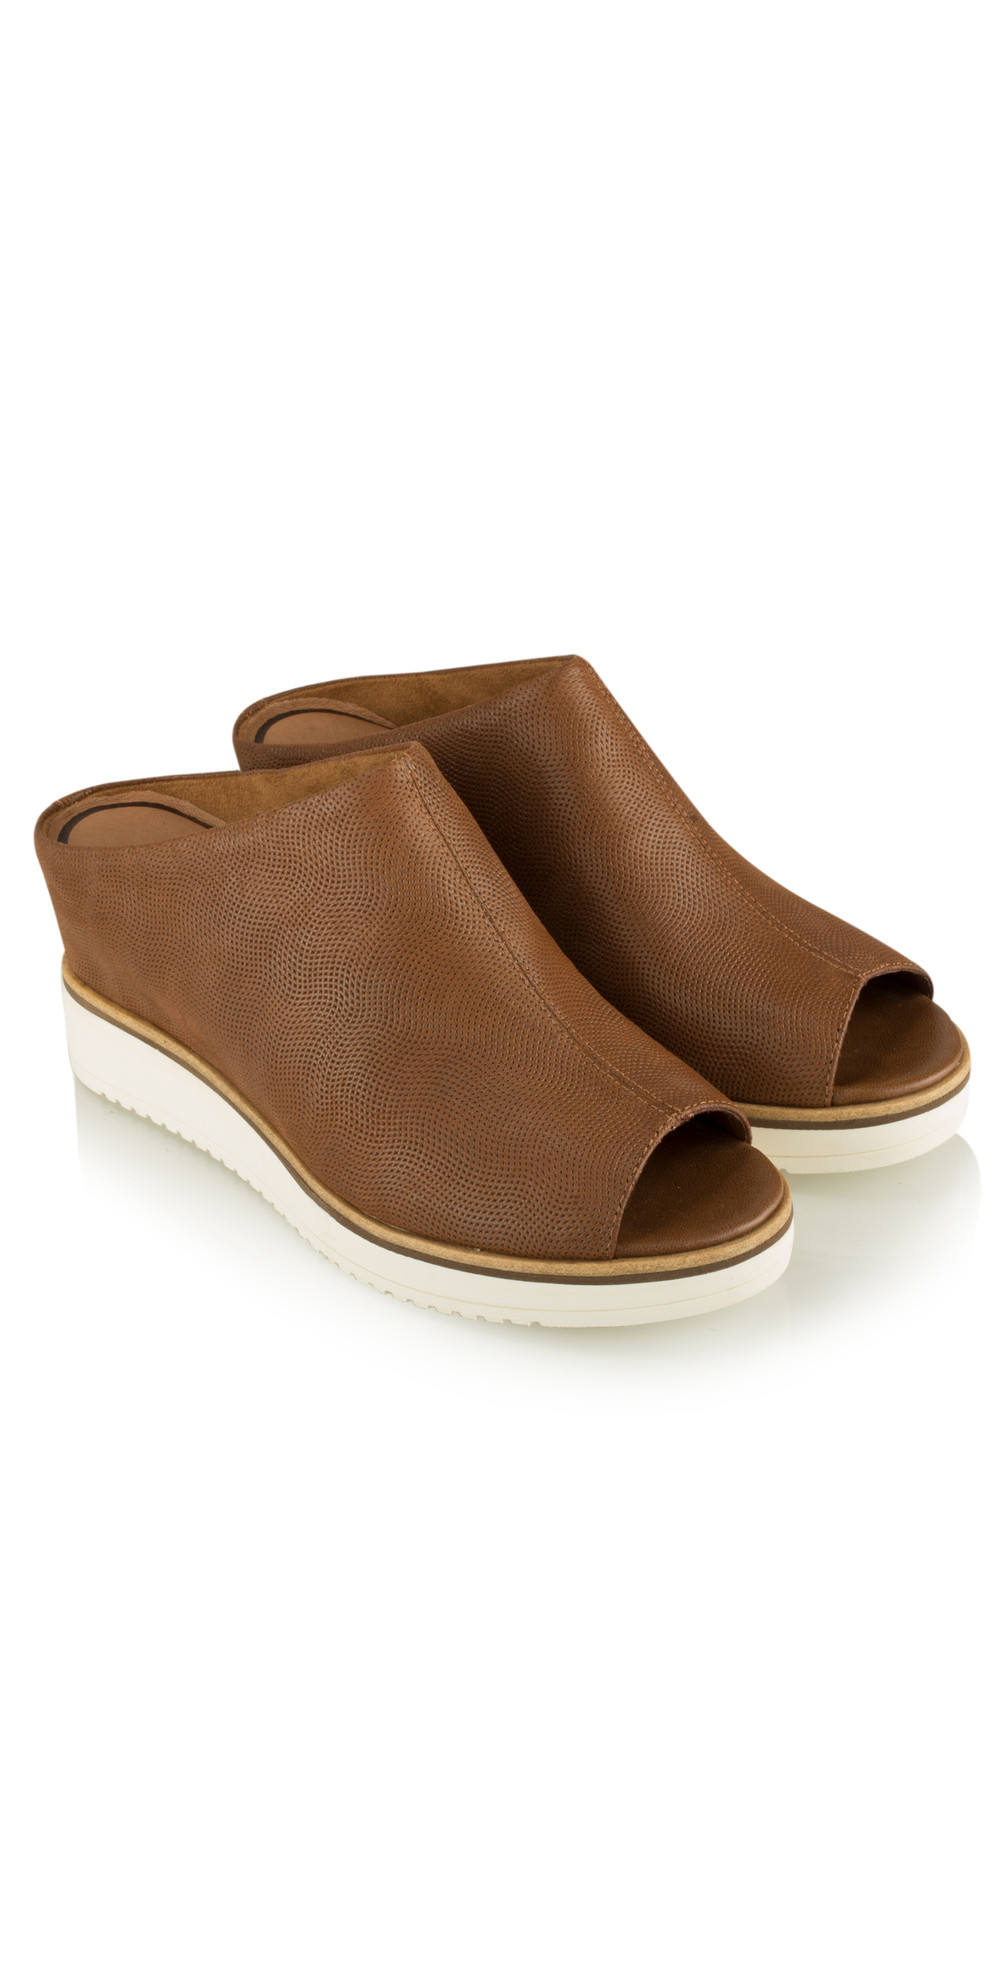 Leather Mule Sandal main image